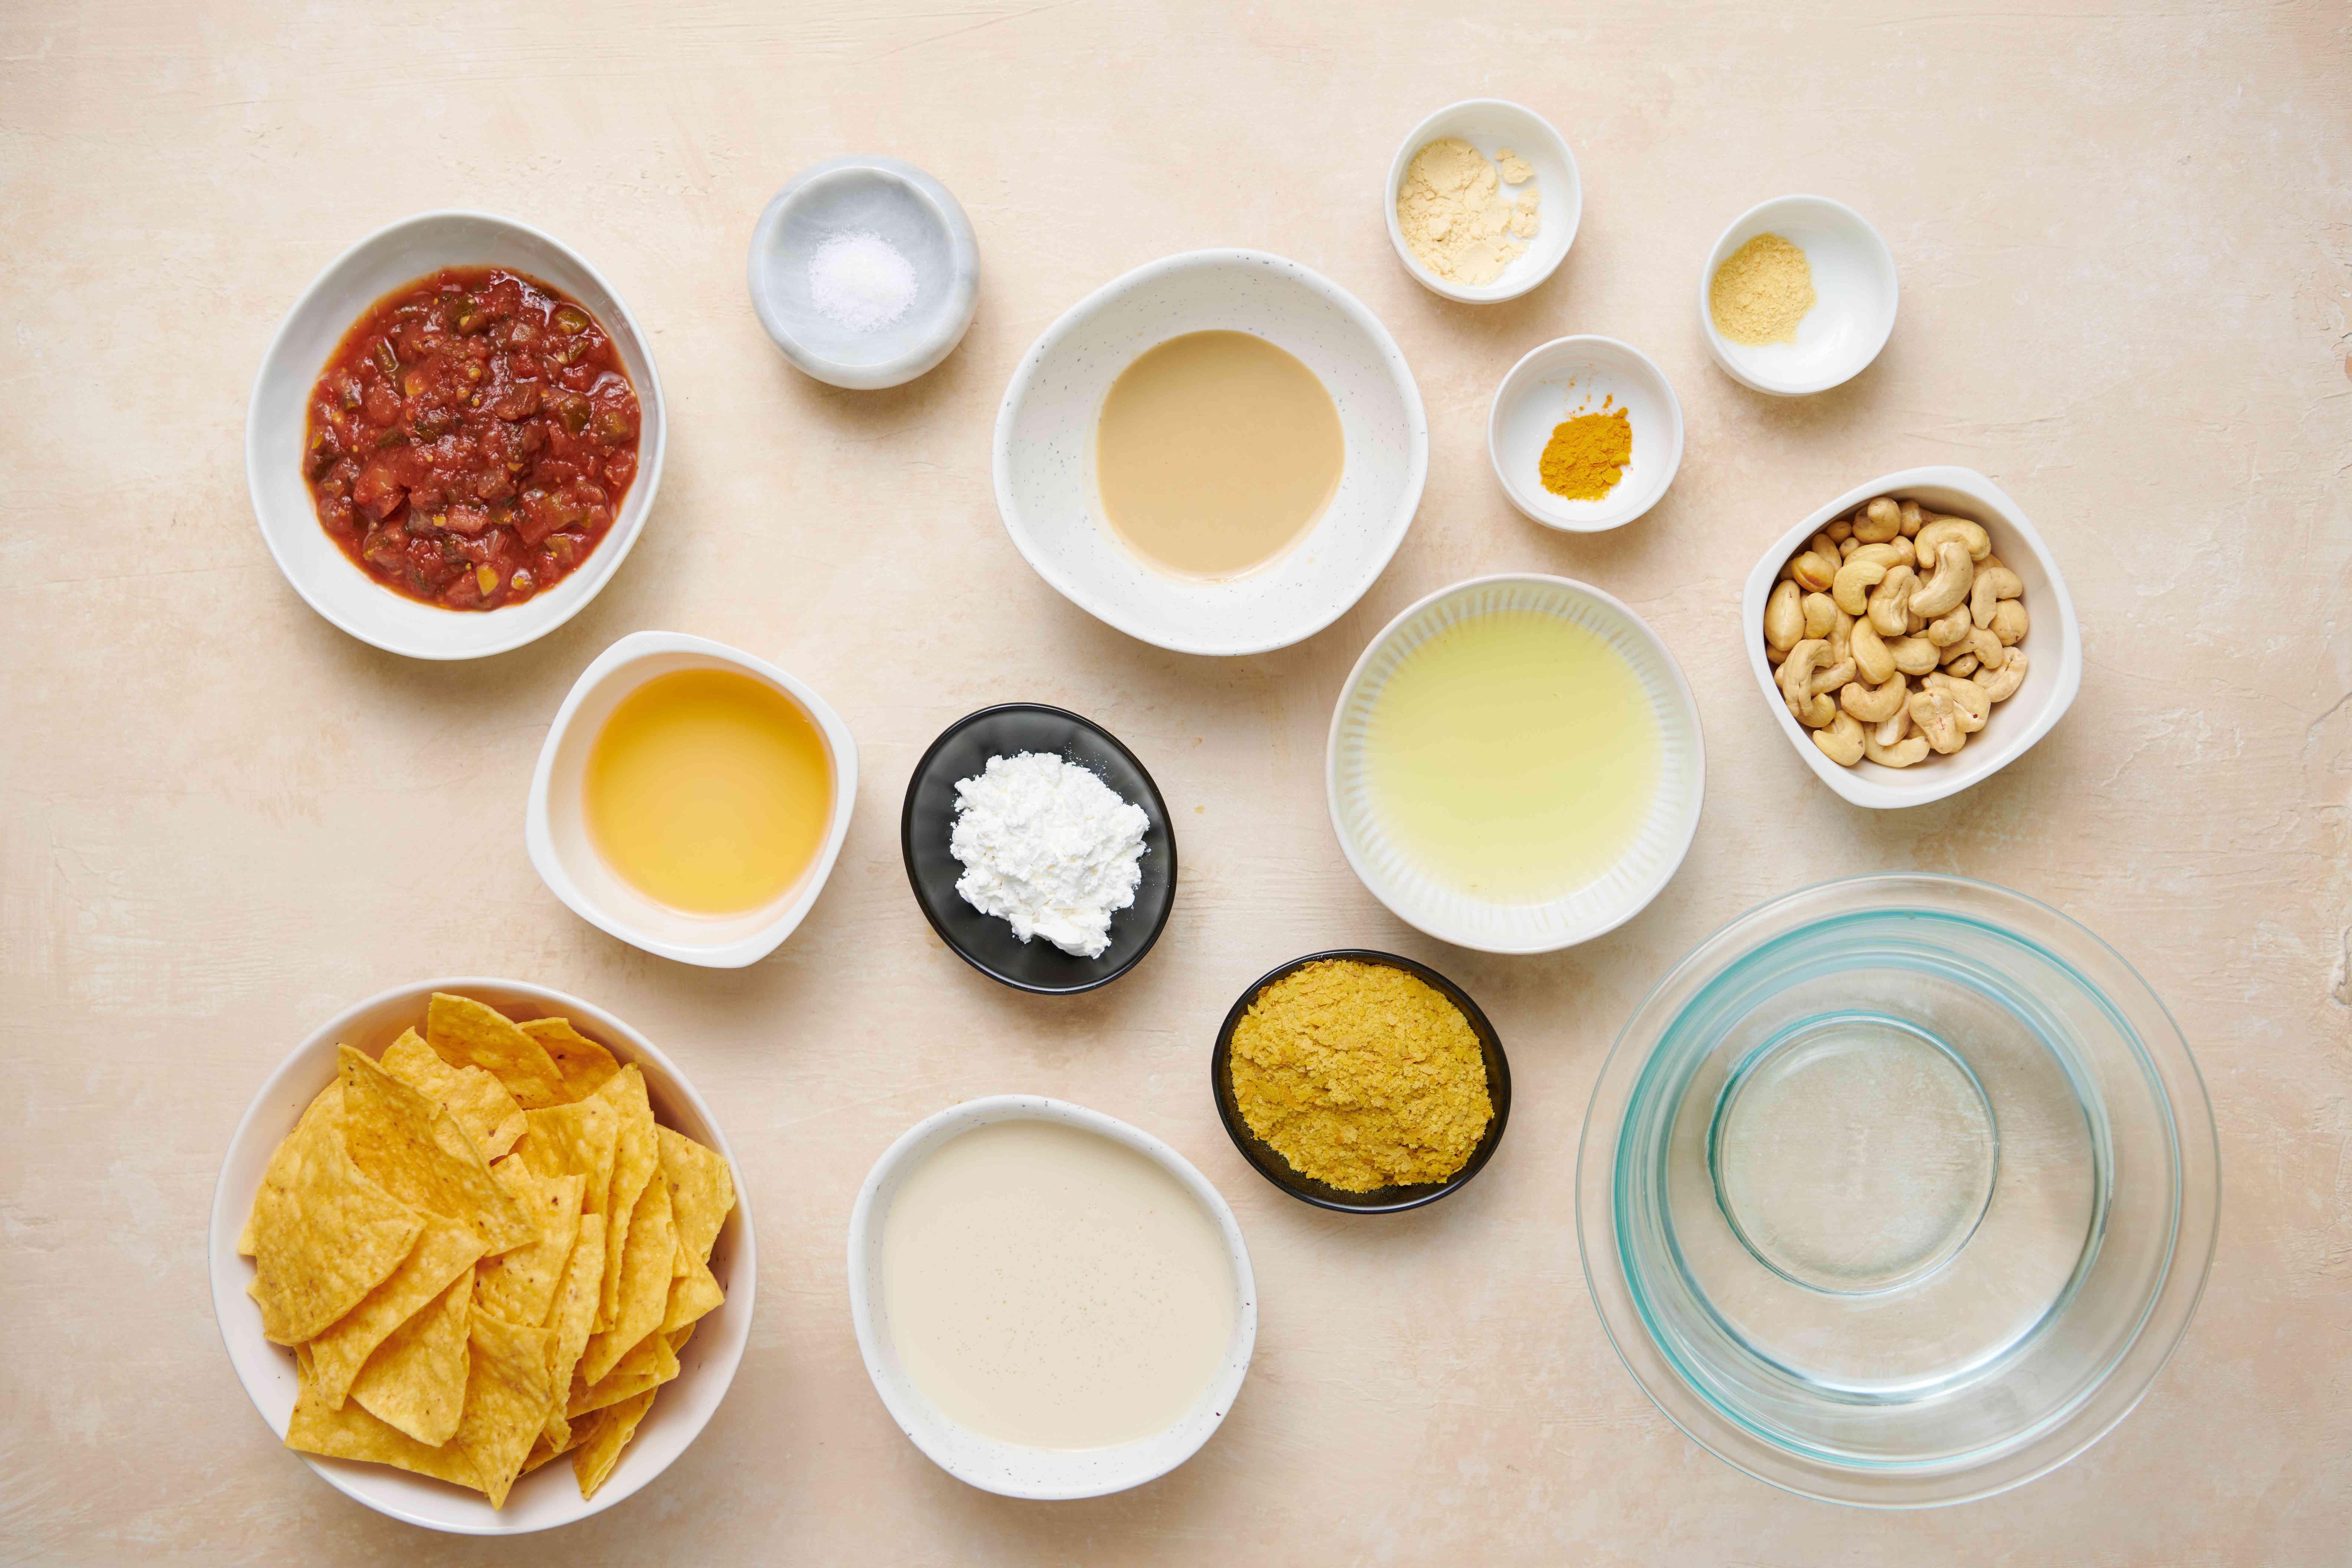 Dairy-Free Queso Dip ingredients